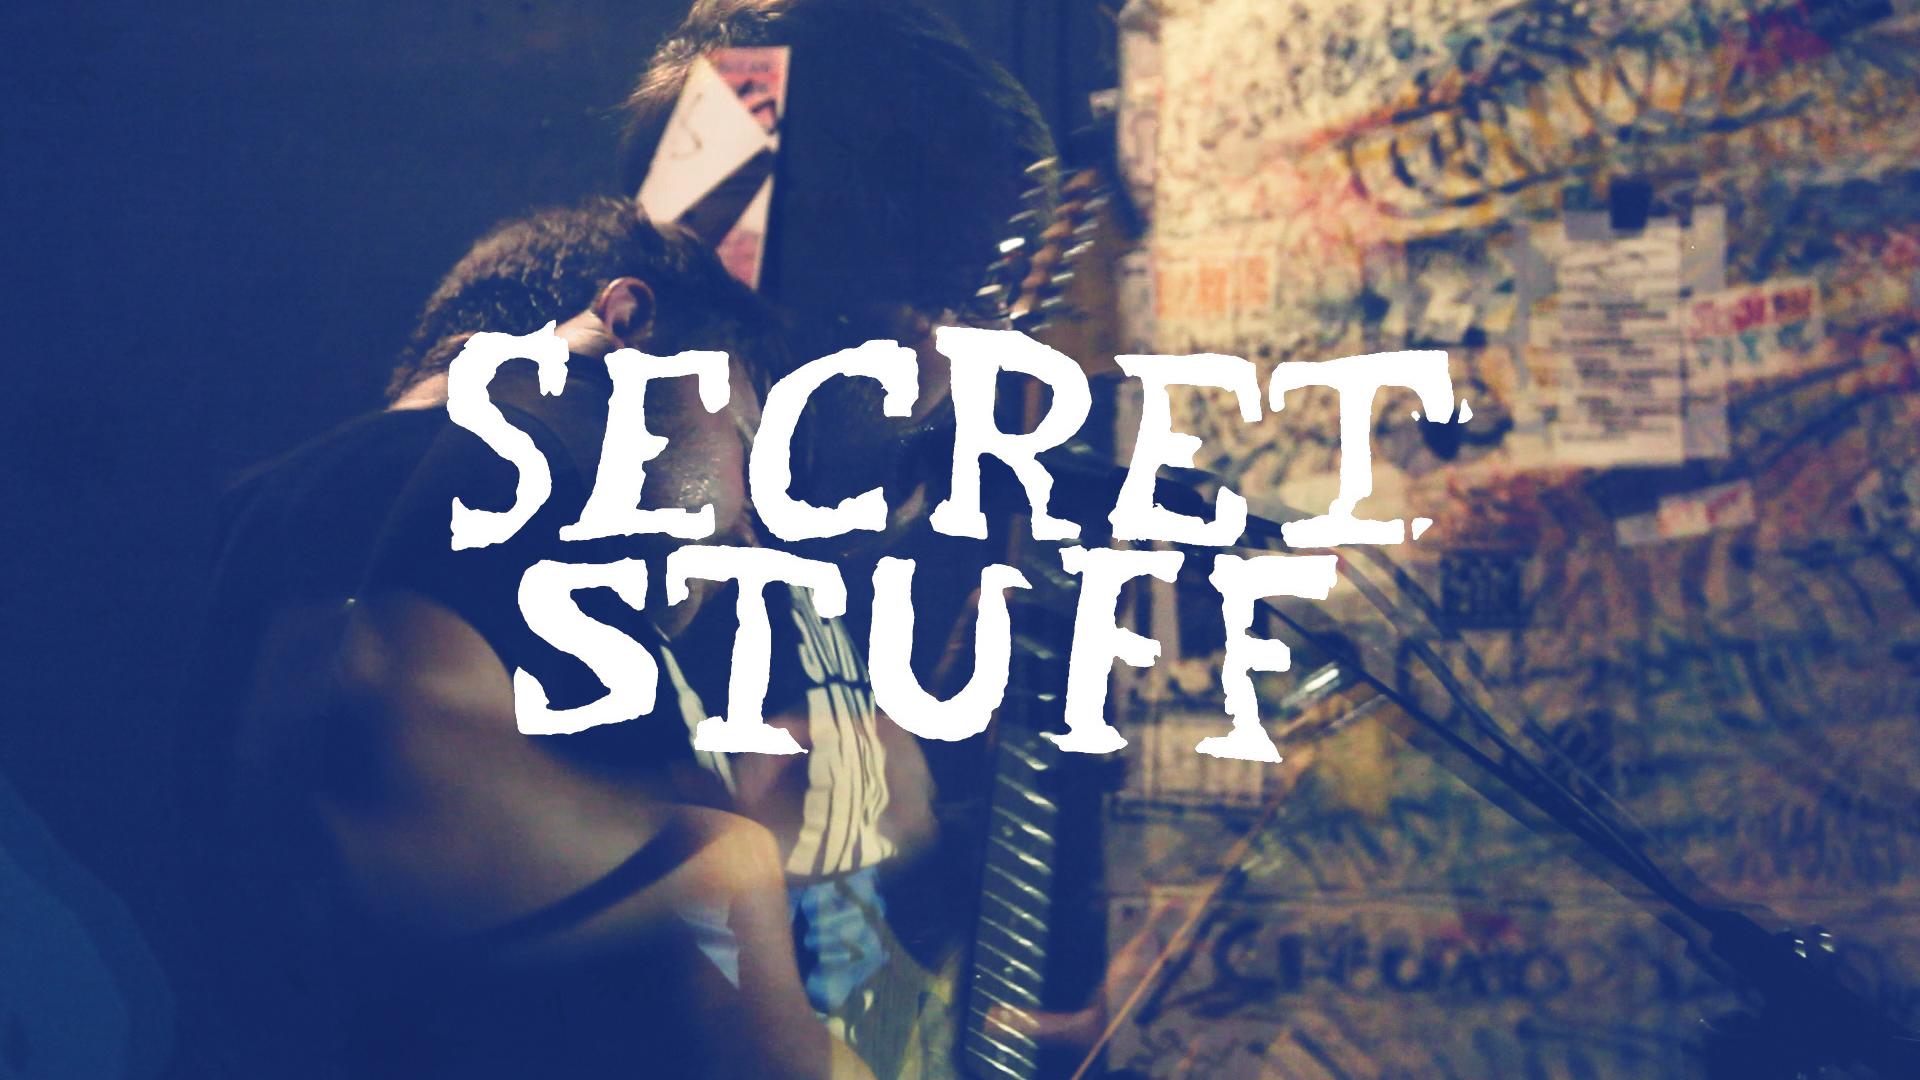 Secret Stuff - on diy and emo - Editor & Director